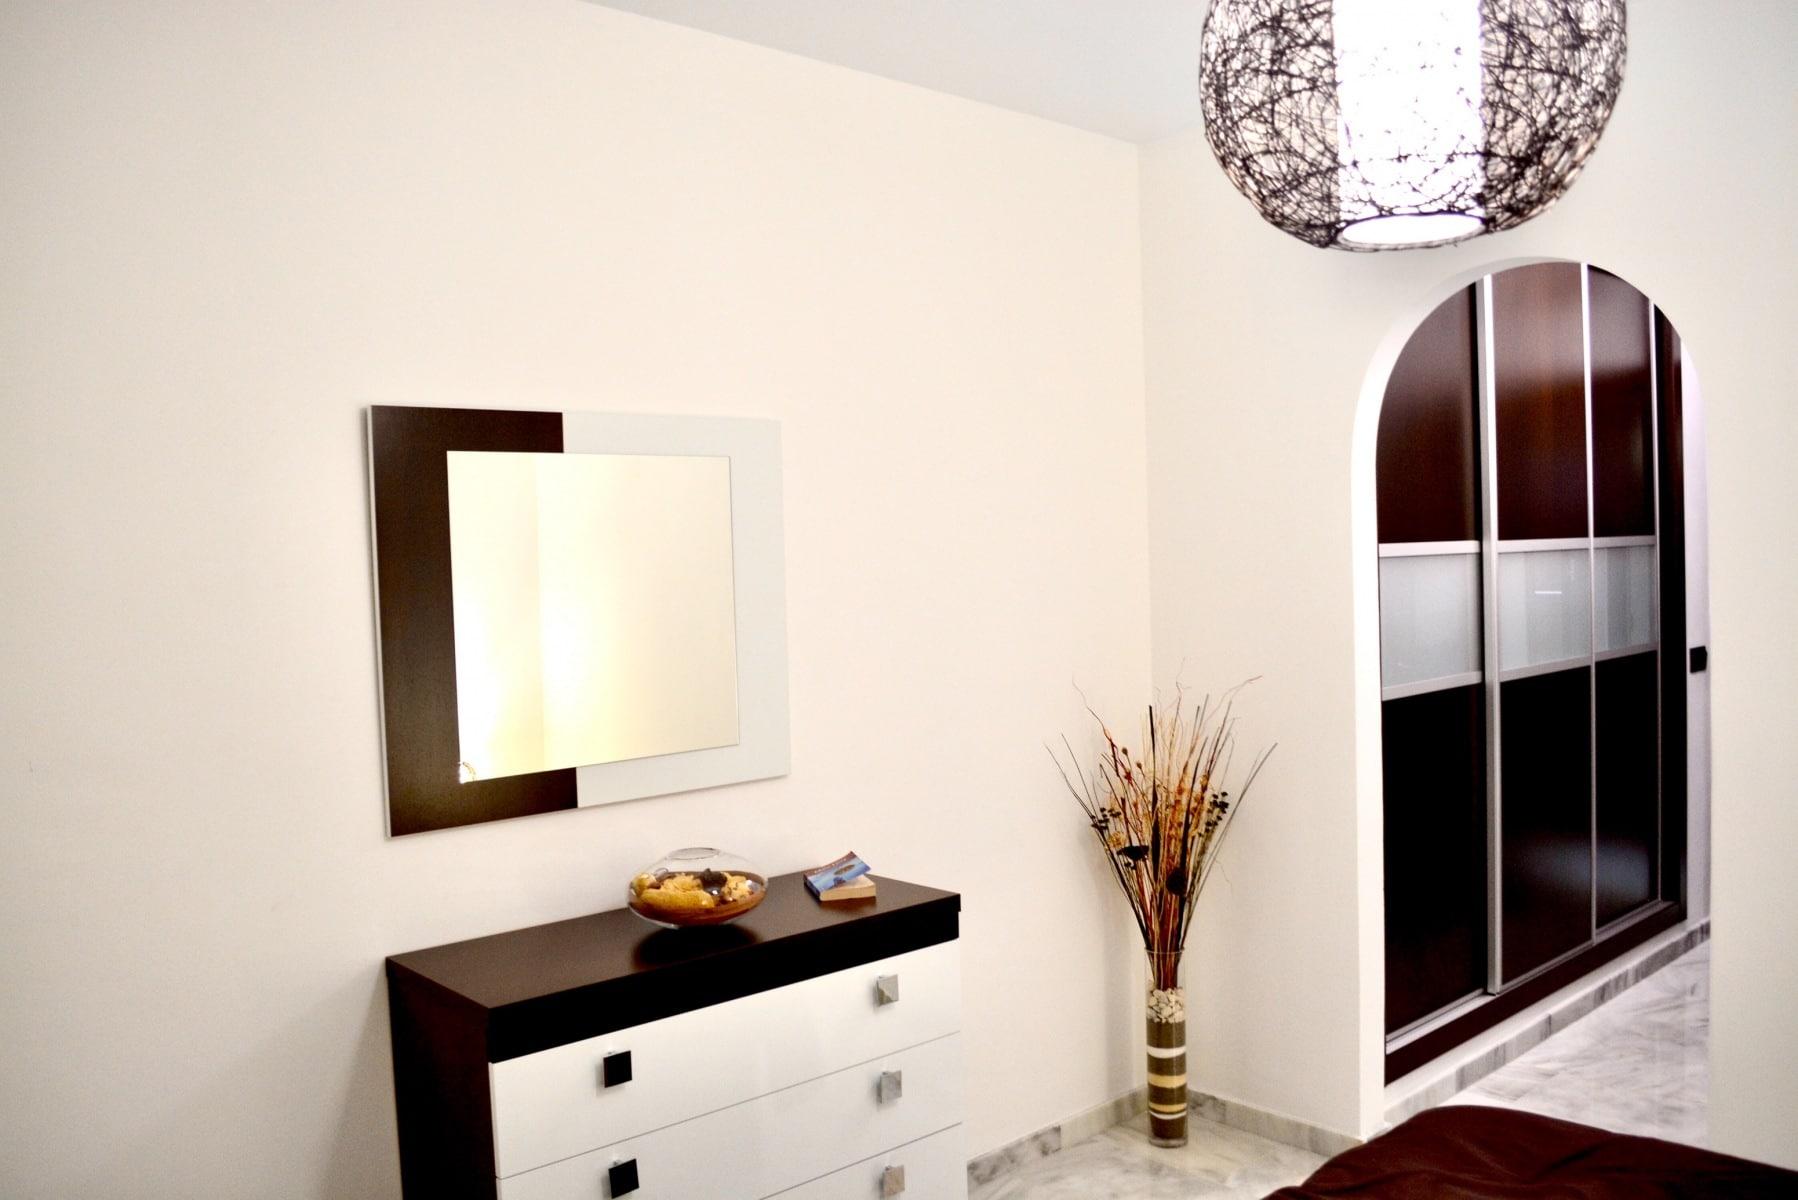 Bedroom renovation in Spain, Marbella